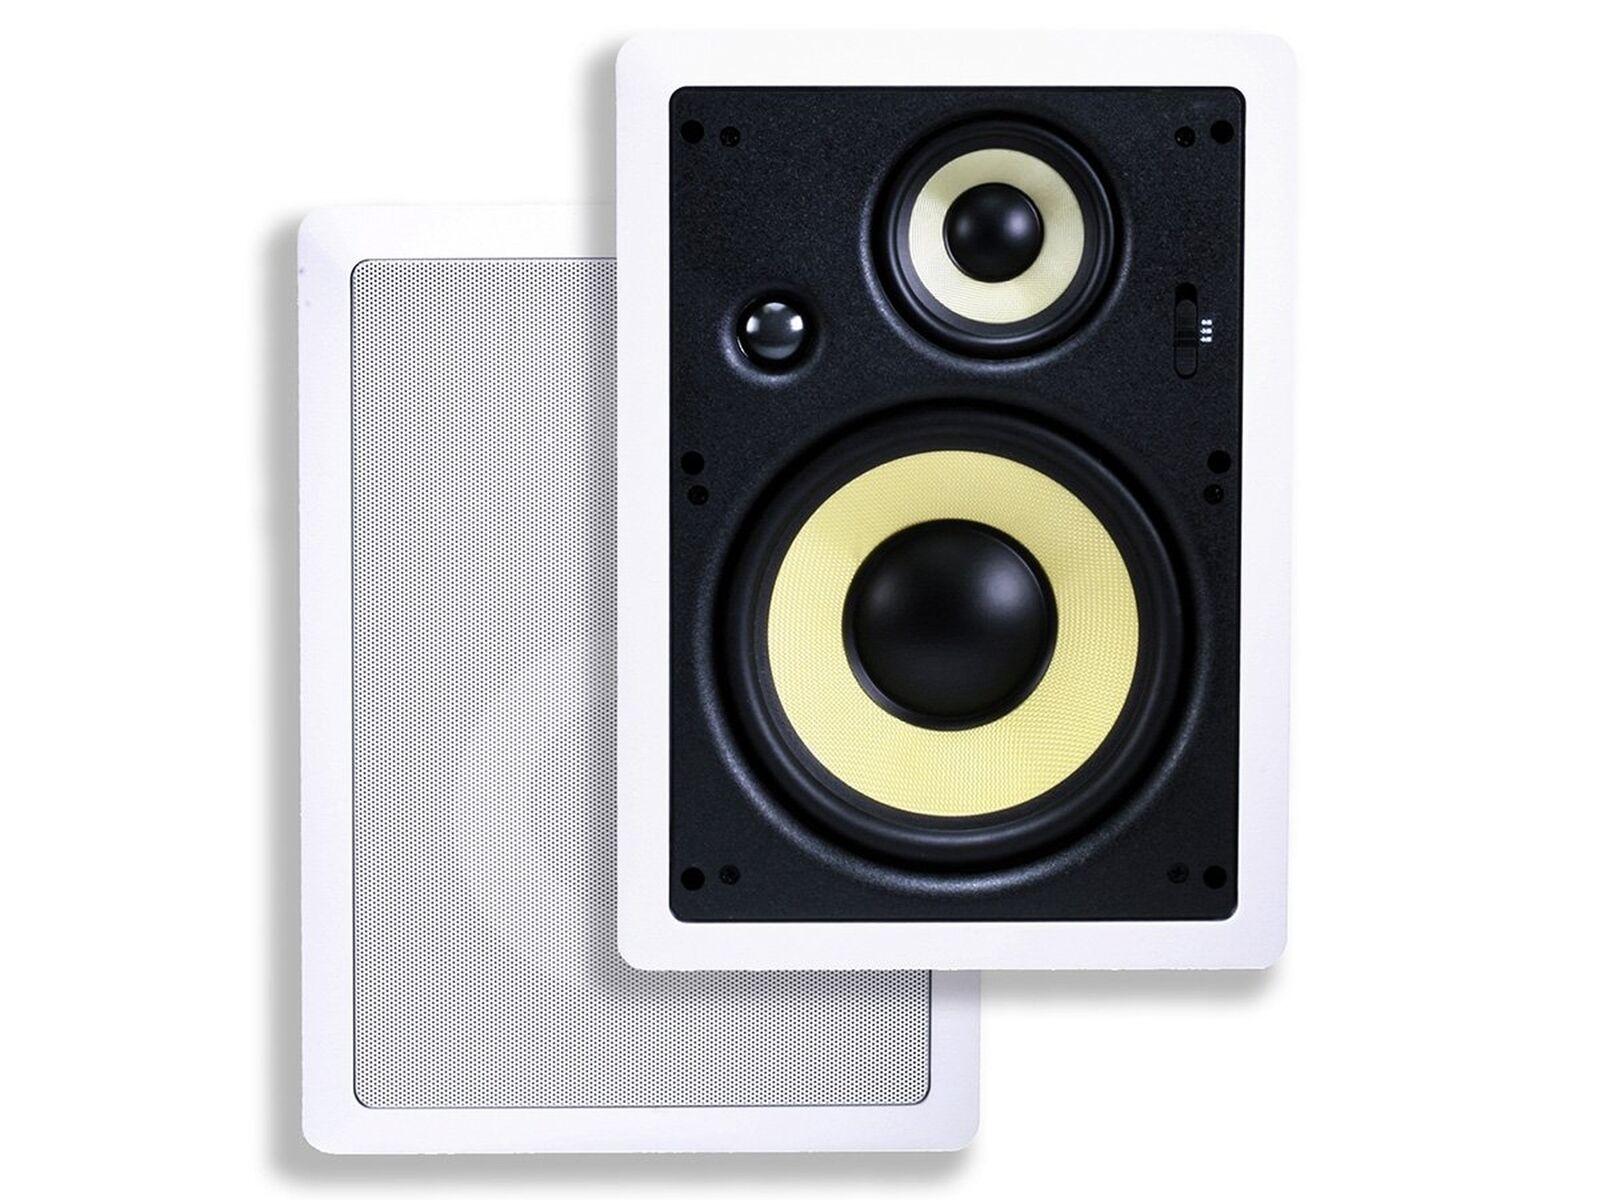 Monoprice Caliber In Wall Speakers 8 Inch Fiber 3-Way (pair) - 106816